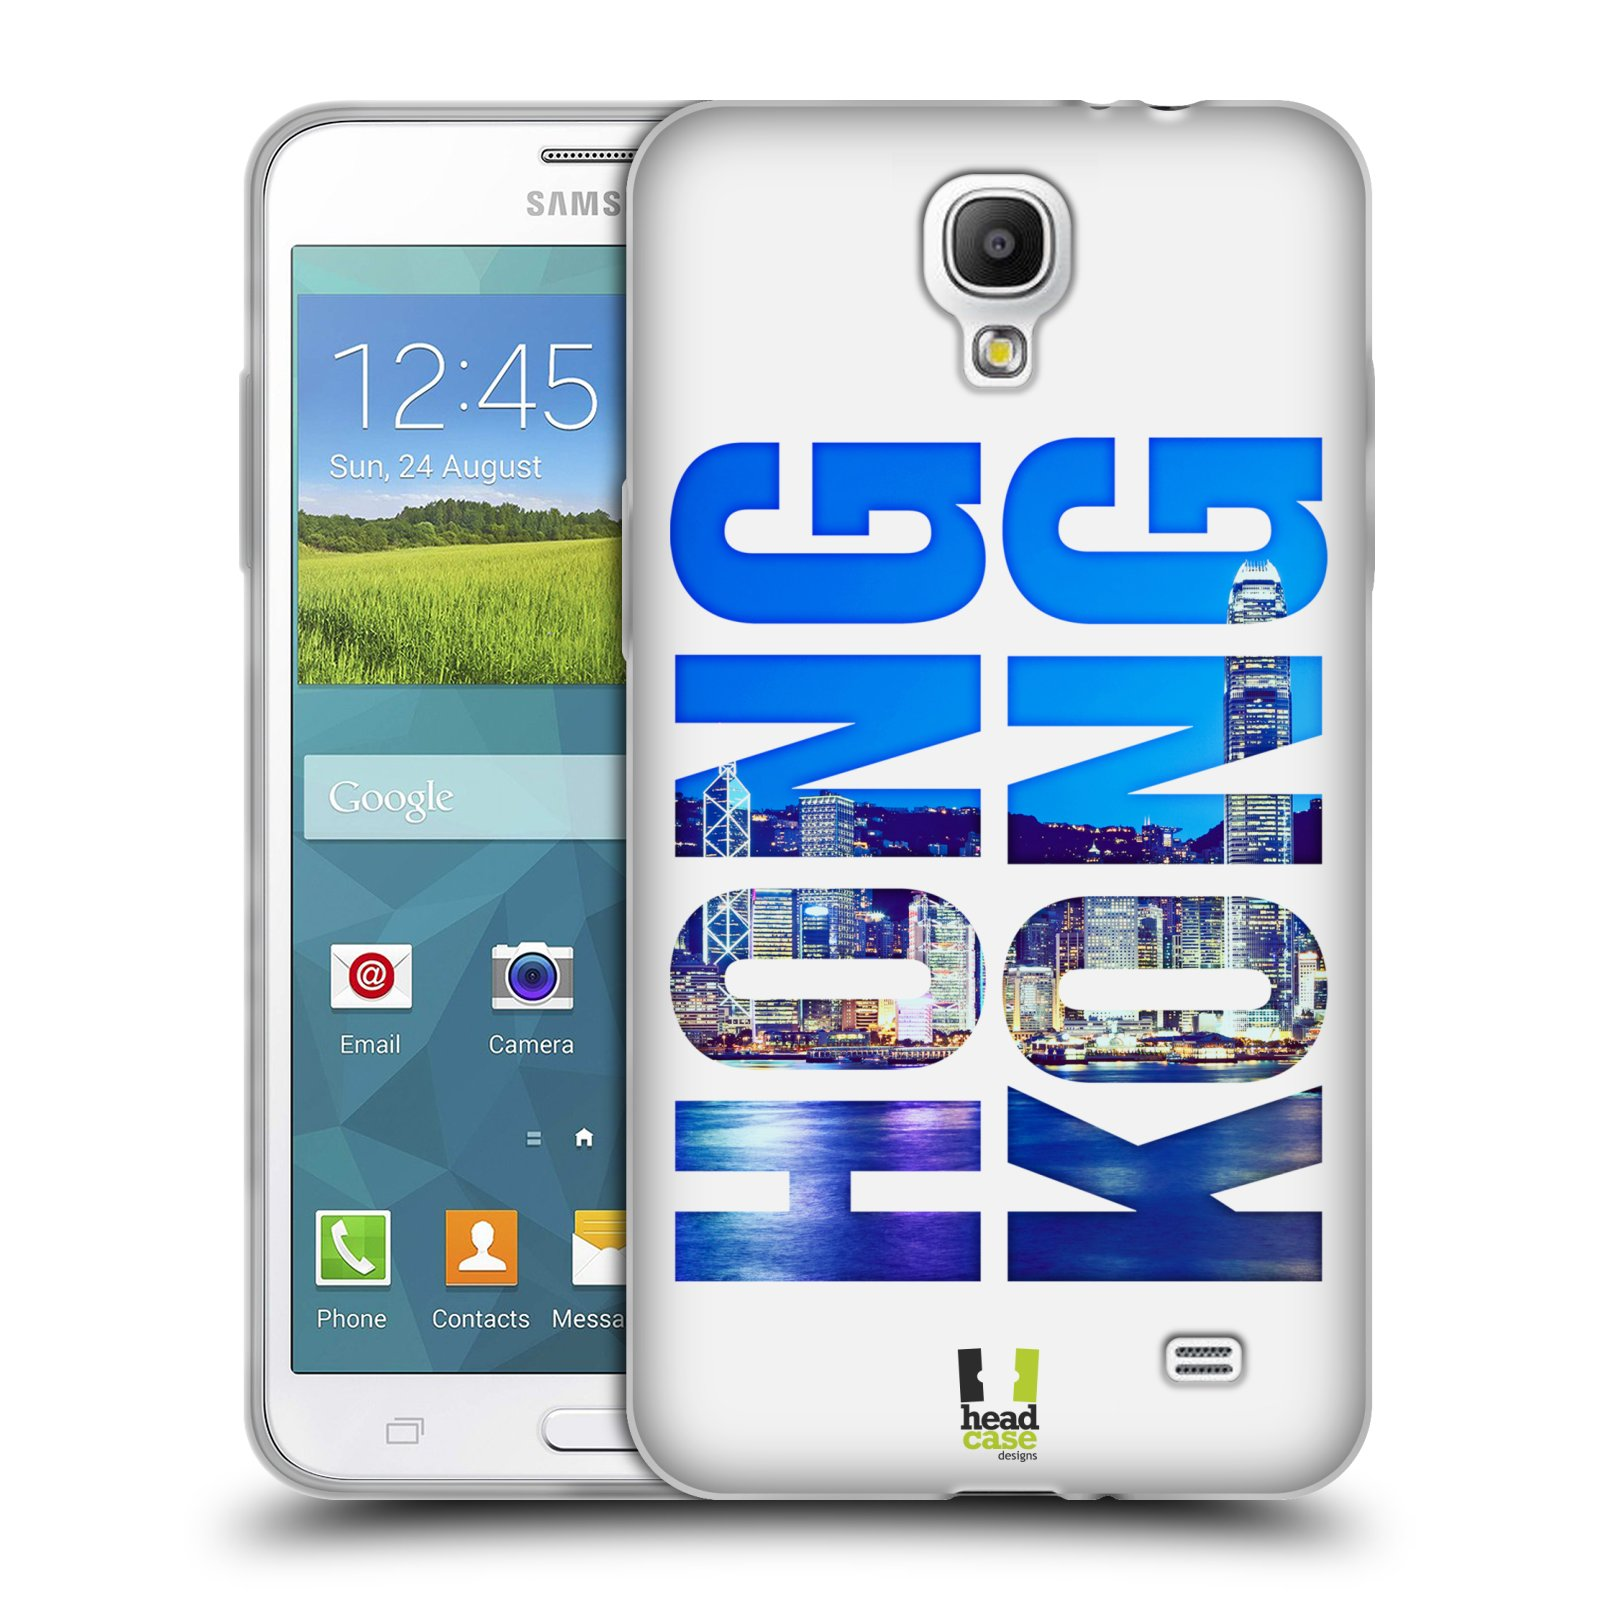 HEAD CASE silikonový obal na mobil Samsung Galaxy Mega 2 vzor Města foto a  nadpis ČÍNA empty 501c4ea3ce5